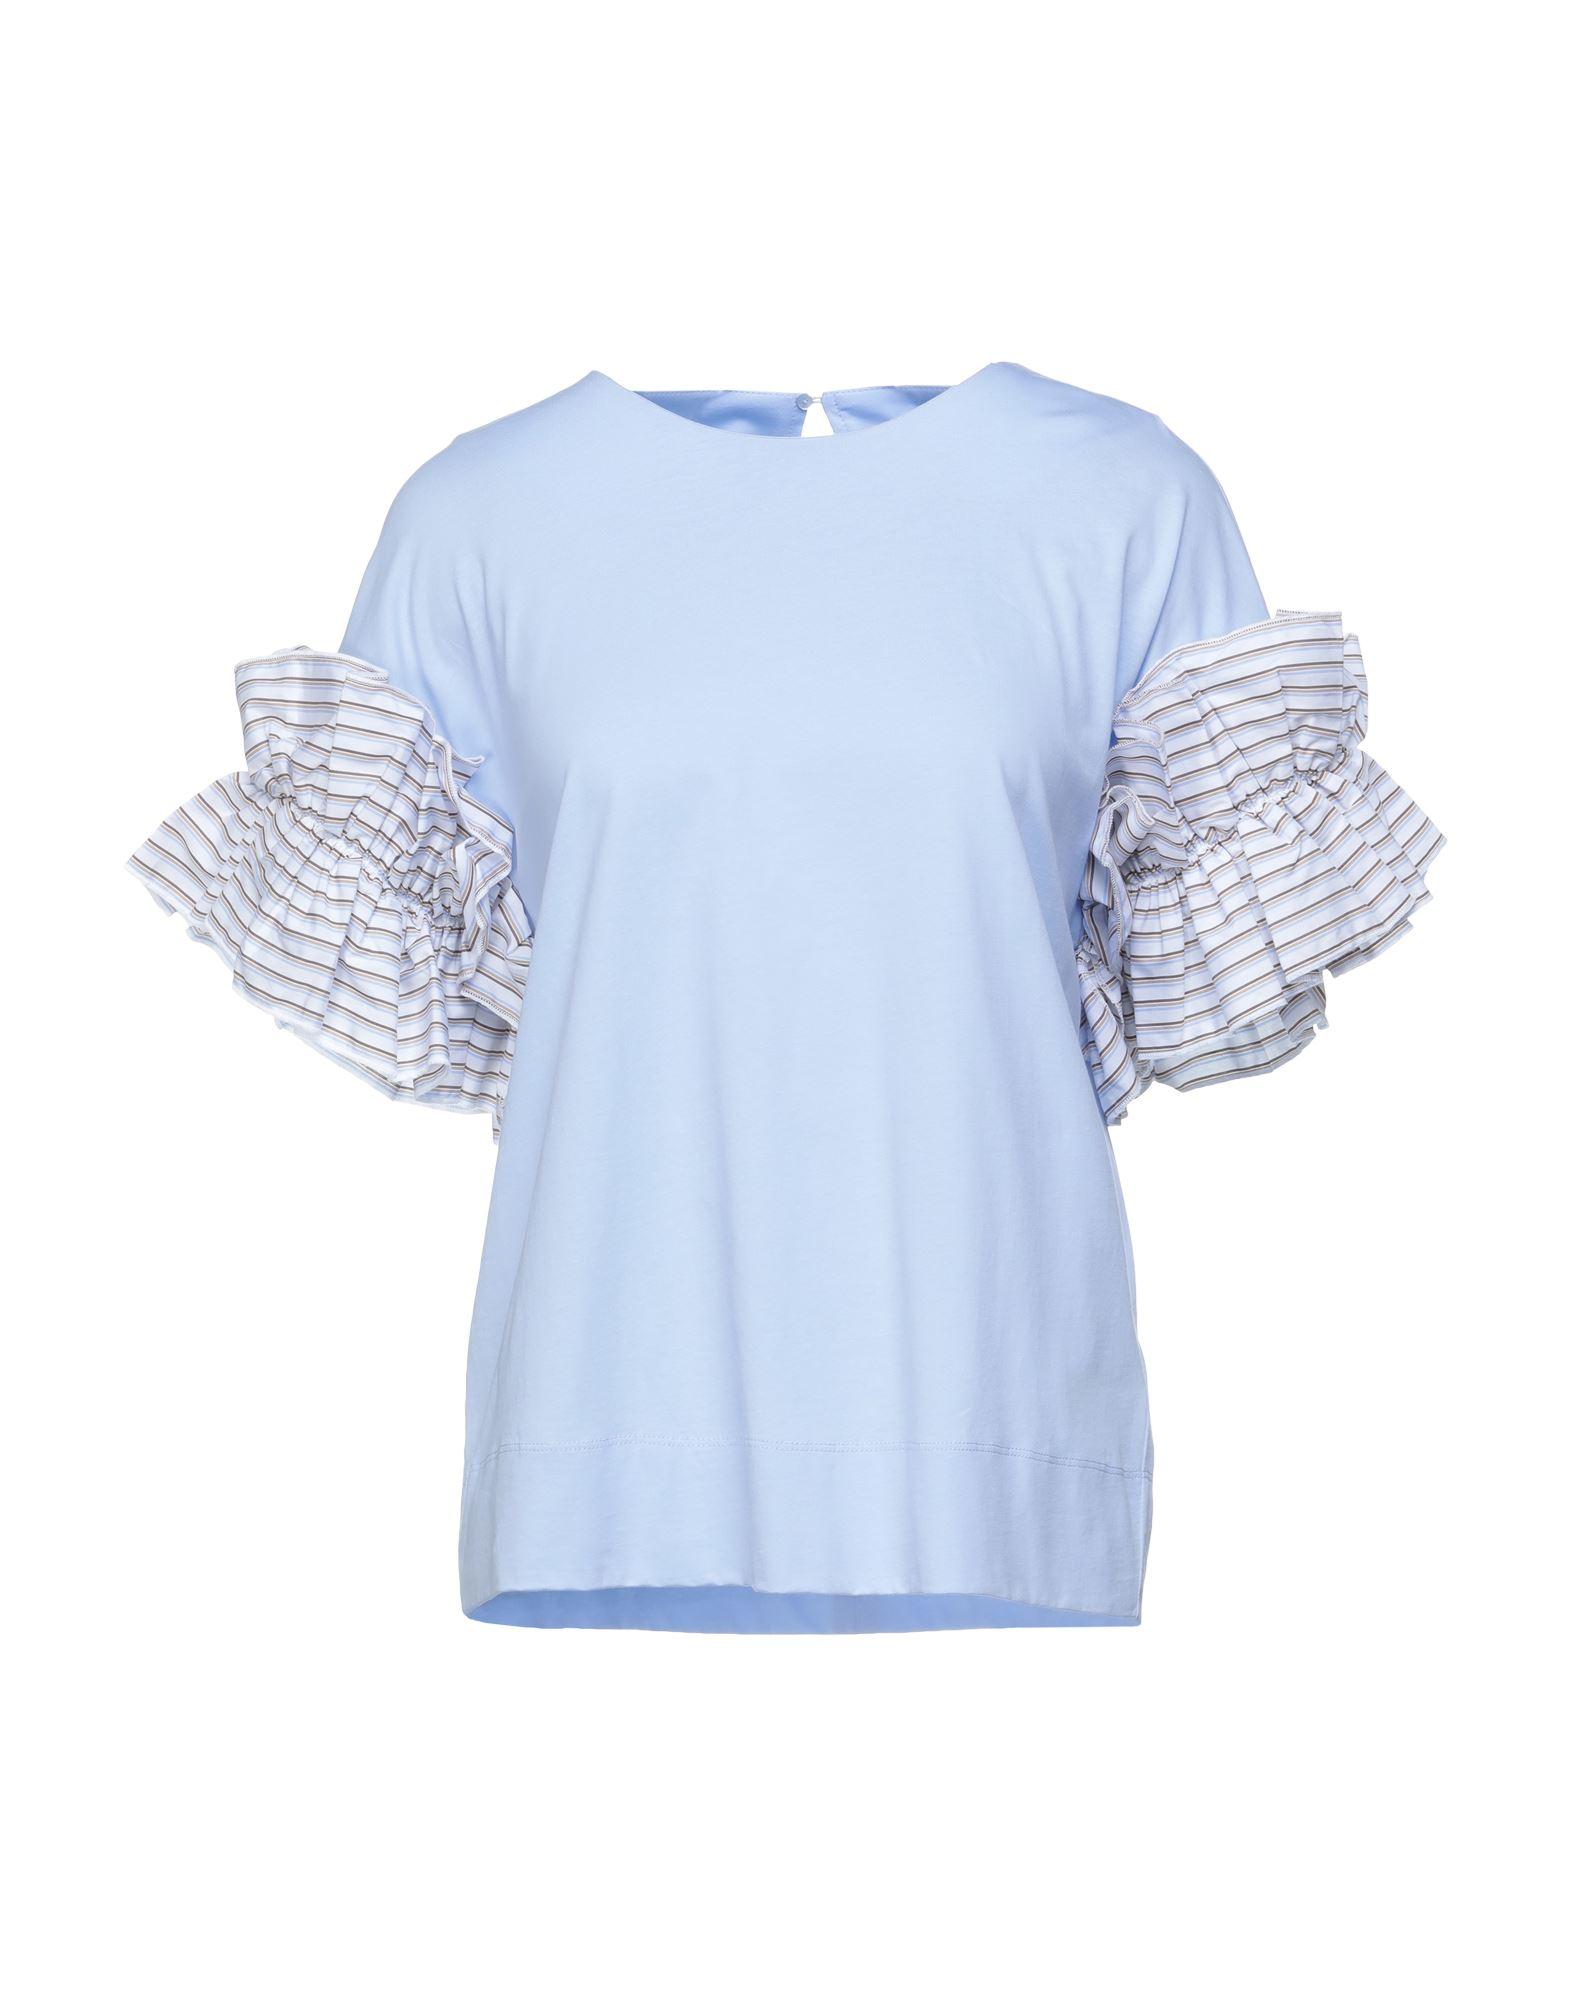 VICTORIA, VICTORIA BECKHAM T-shirts - Item 12585337